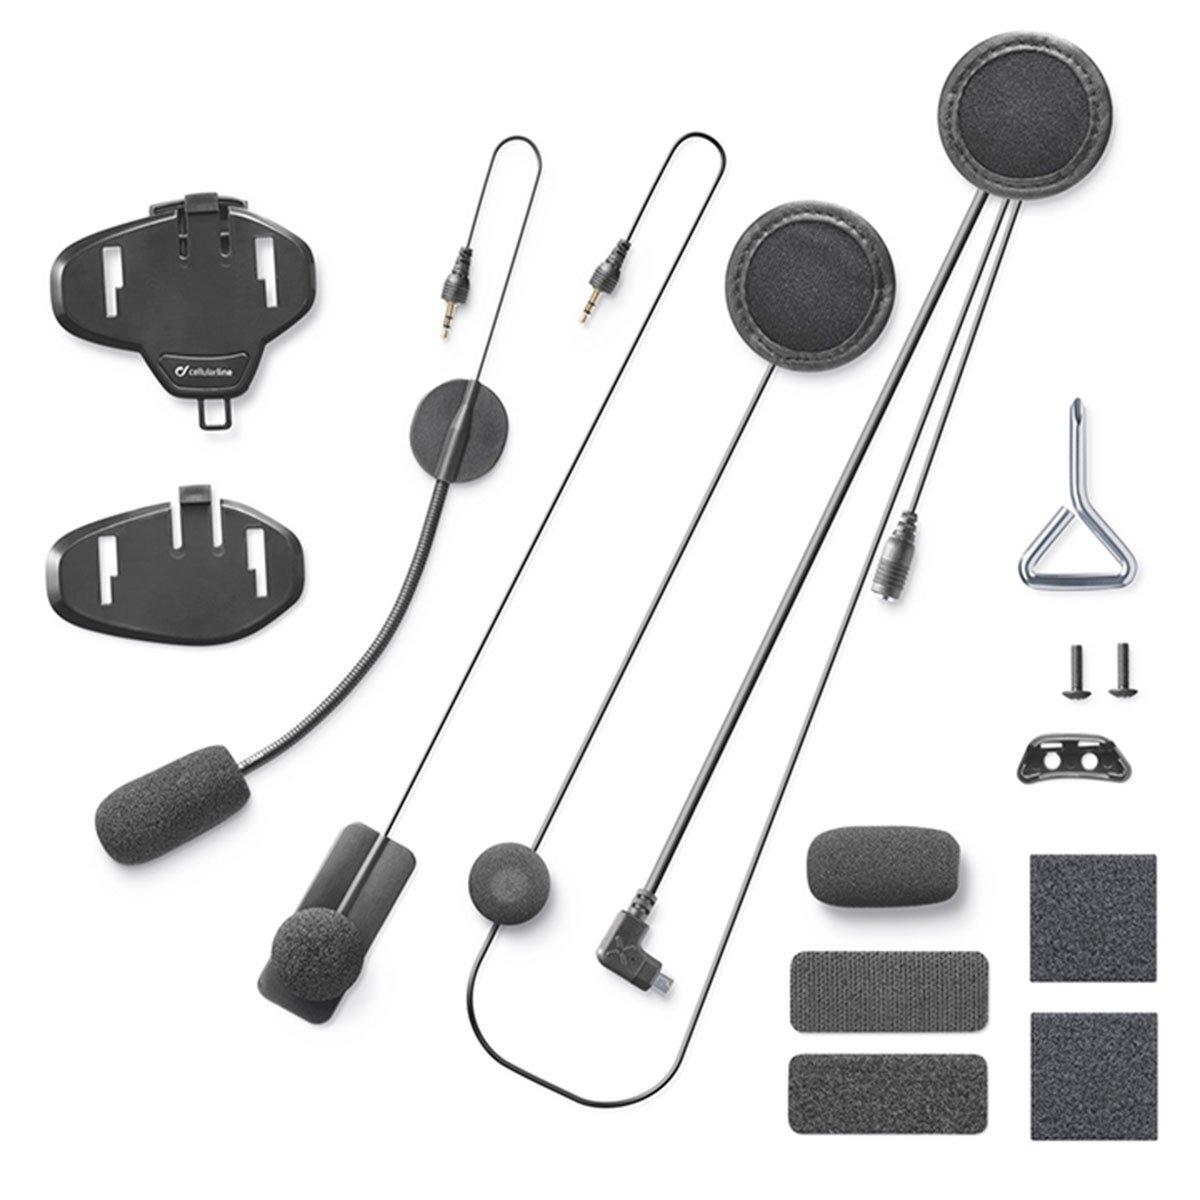 Interphone Mini usb Audio Kit For Helmet Communication System